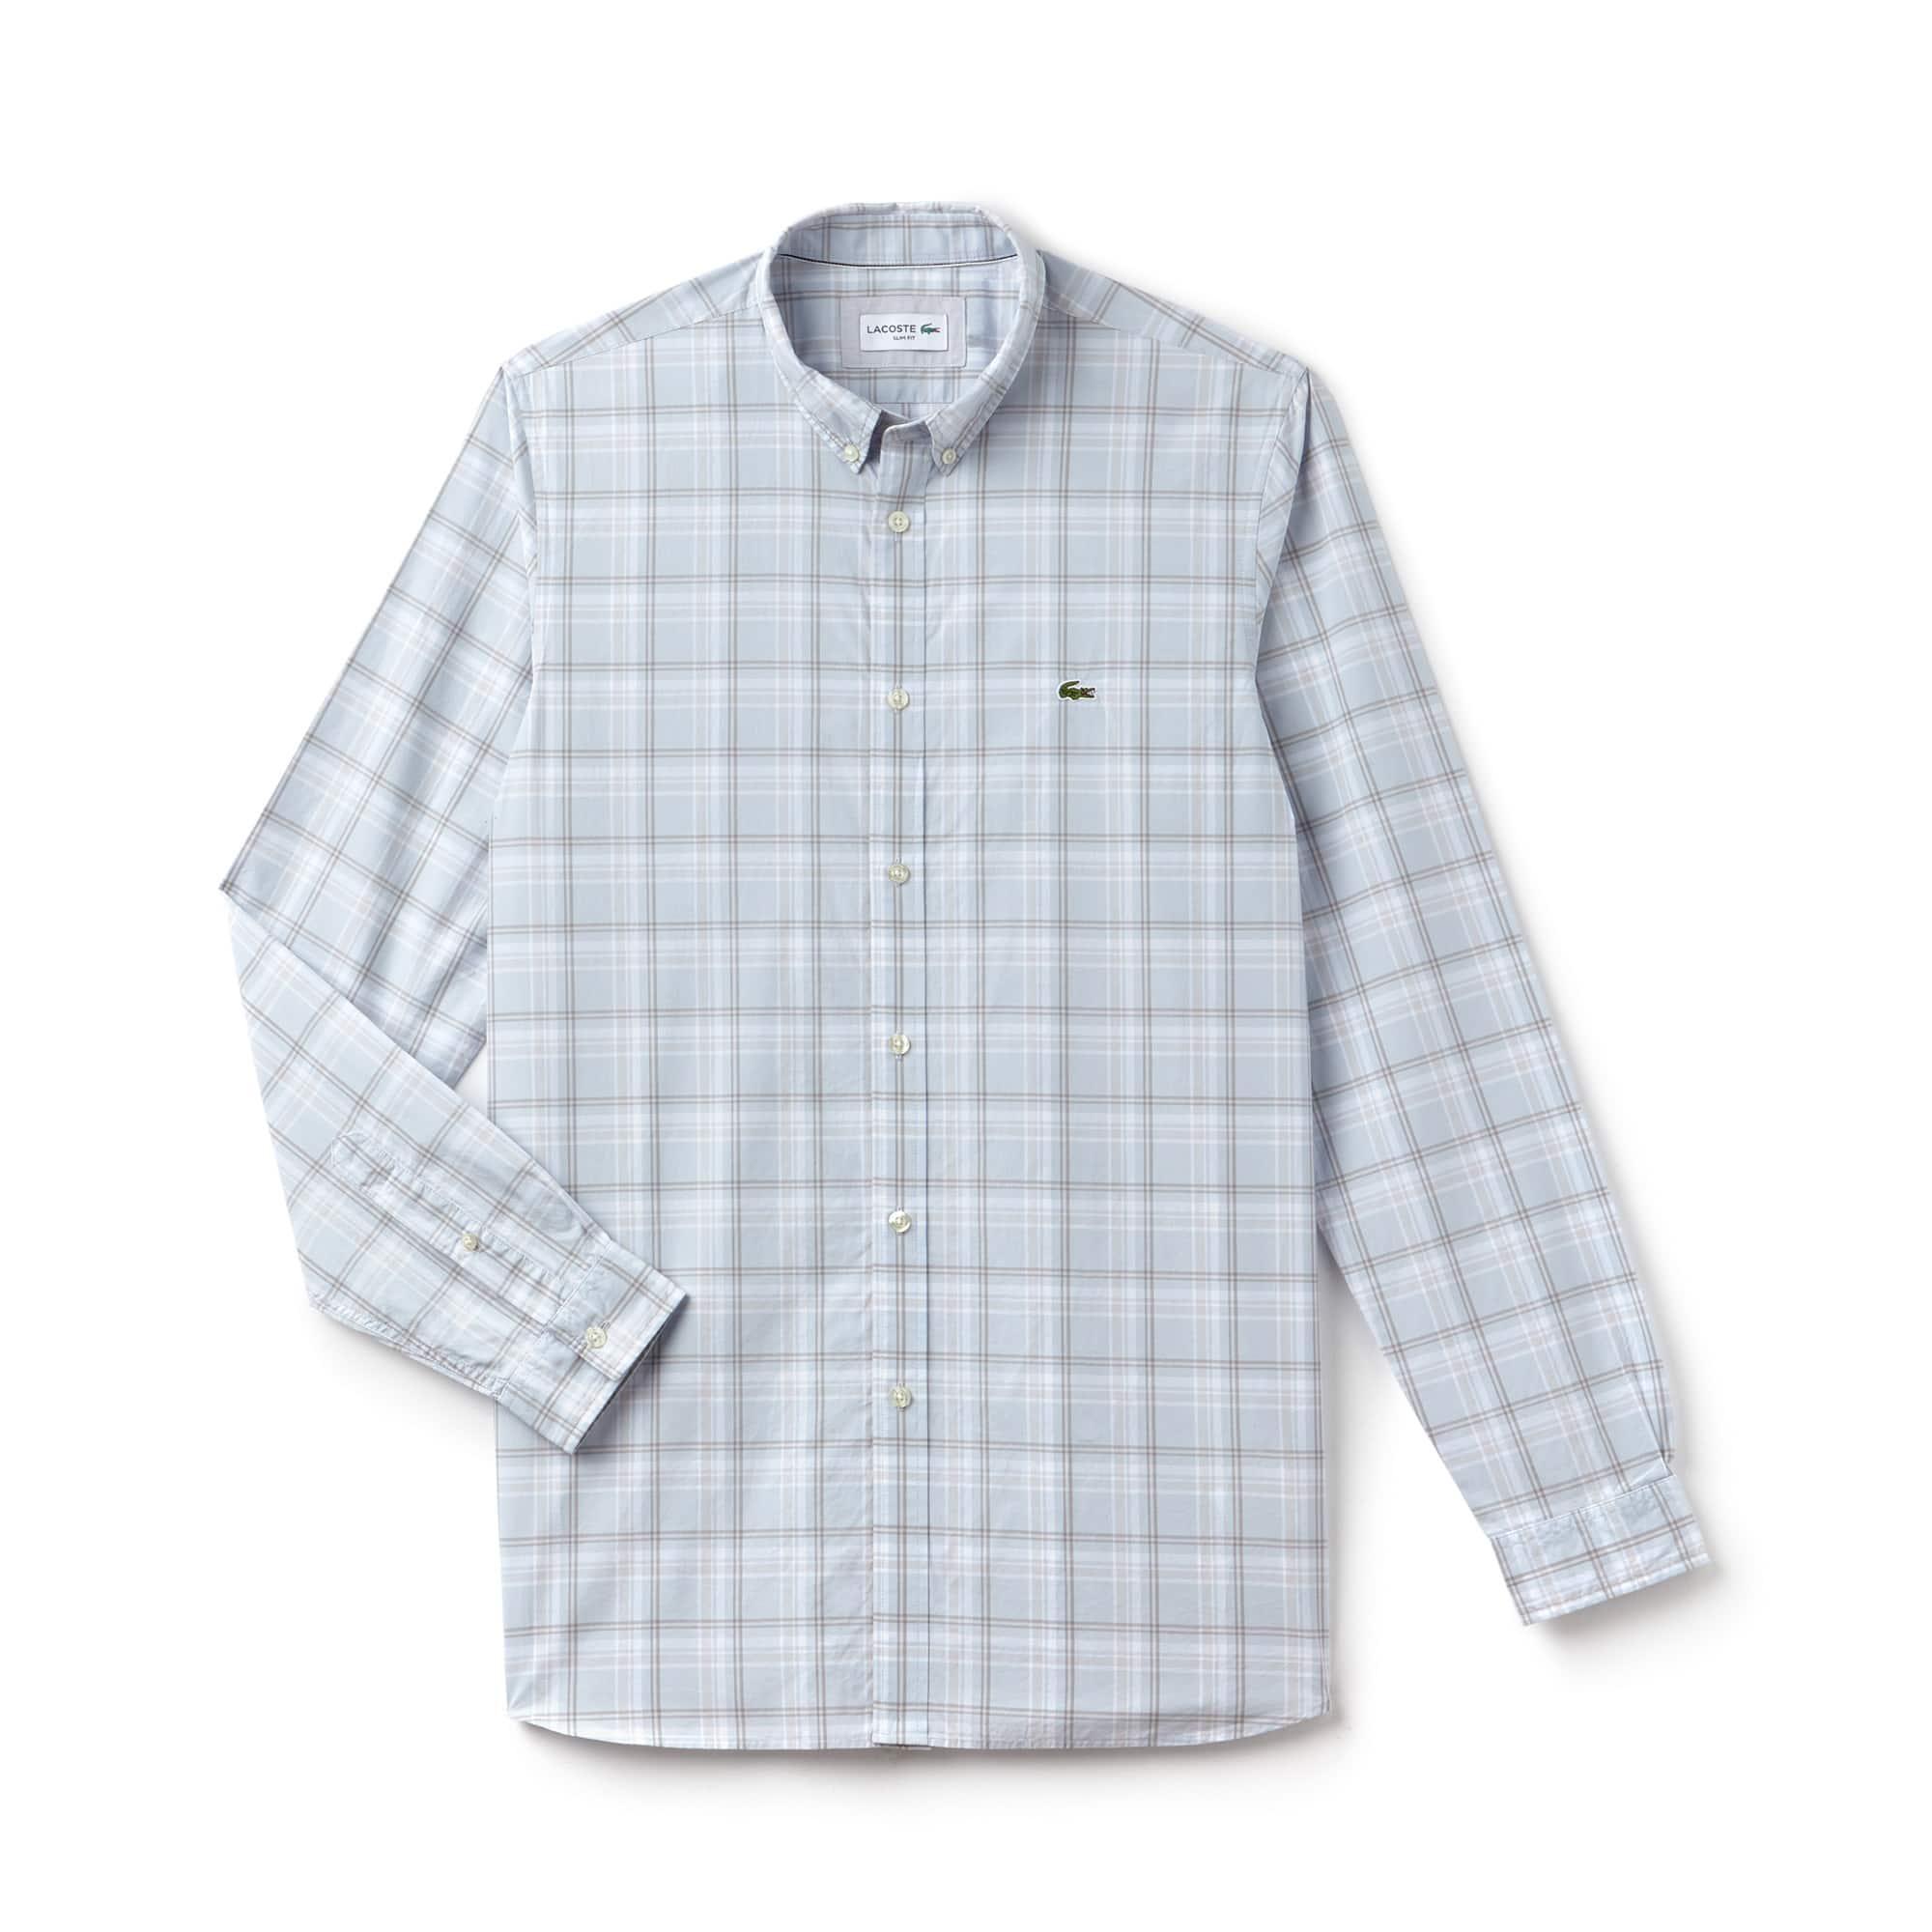 Men's Slim Fit Wide Check Cotton Poplin Shirt